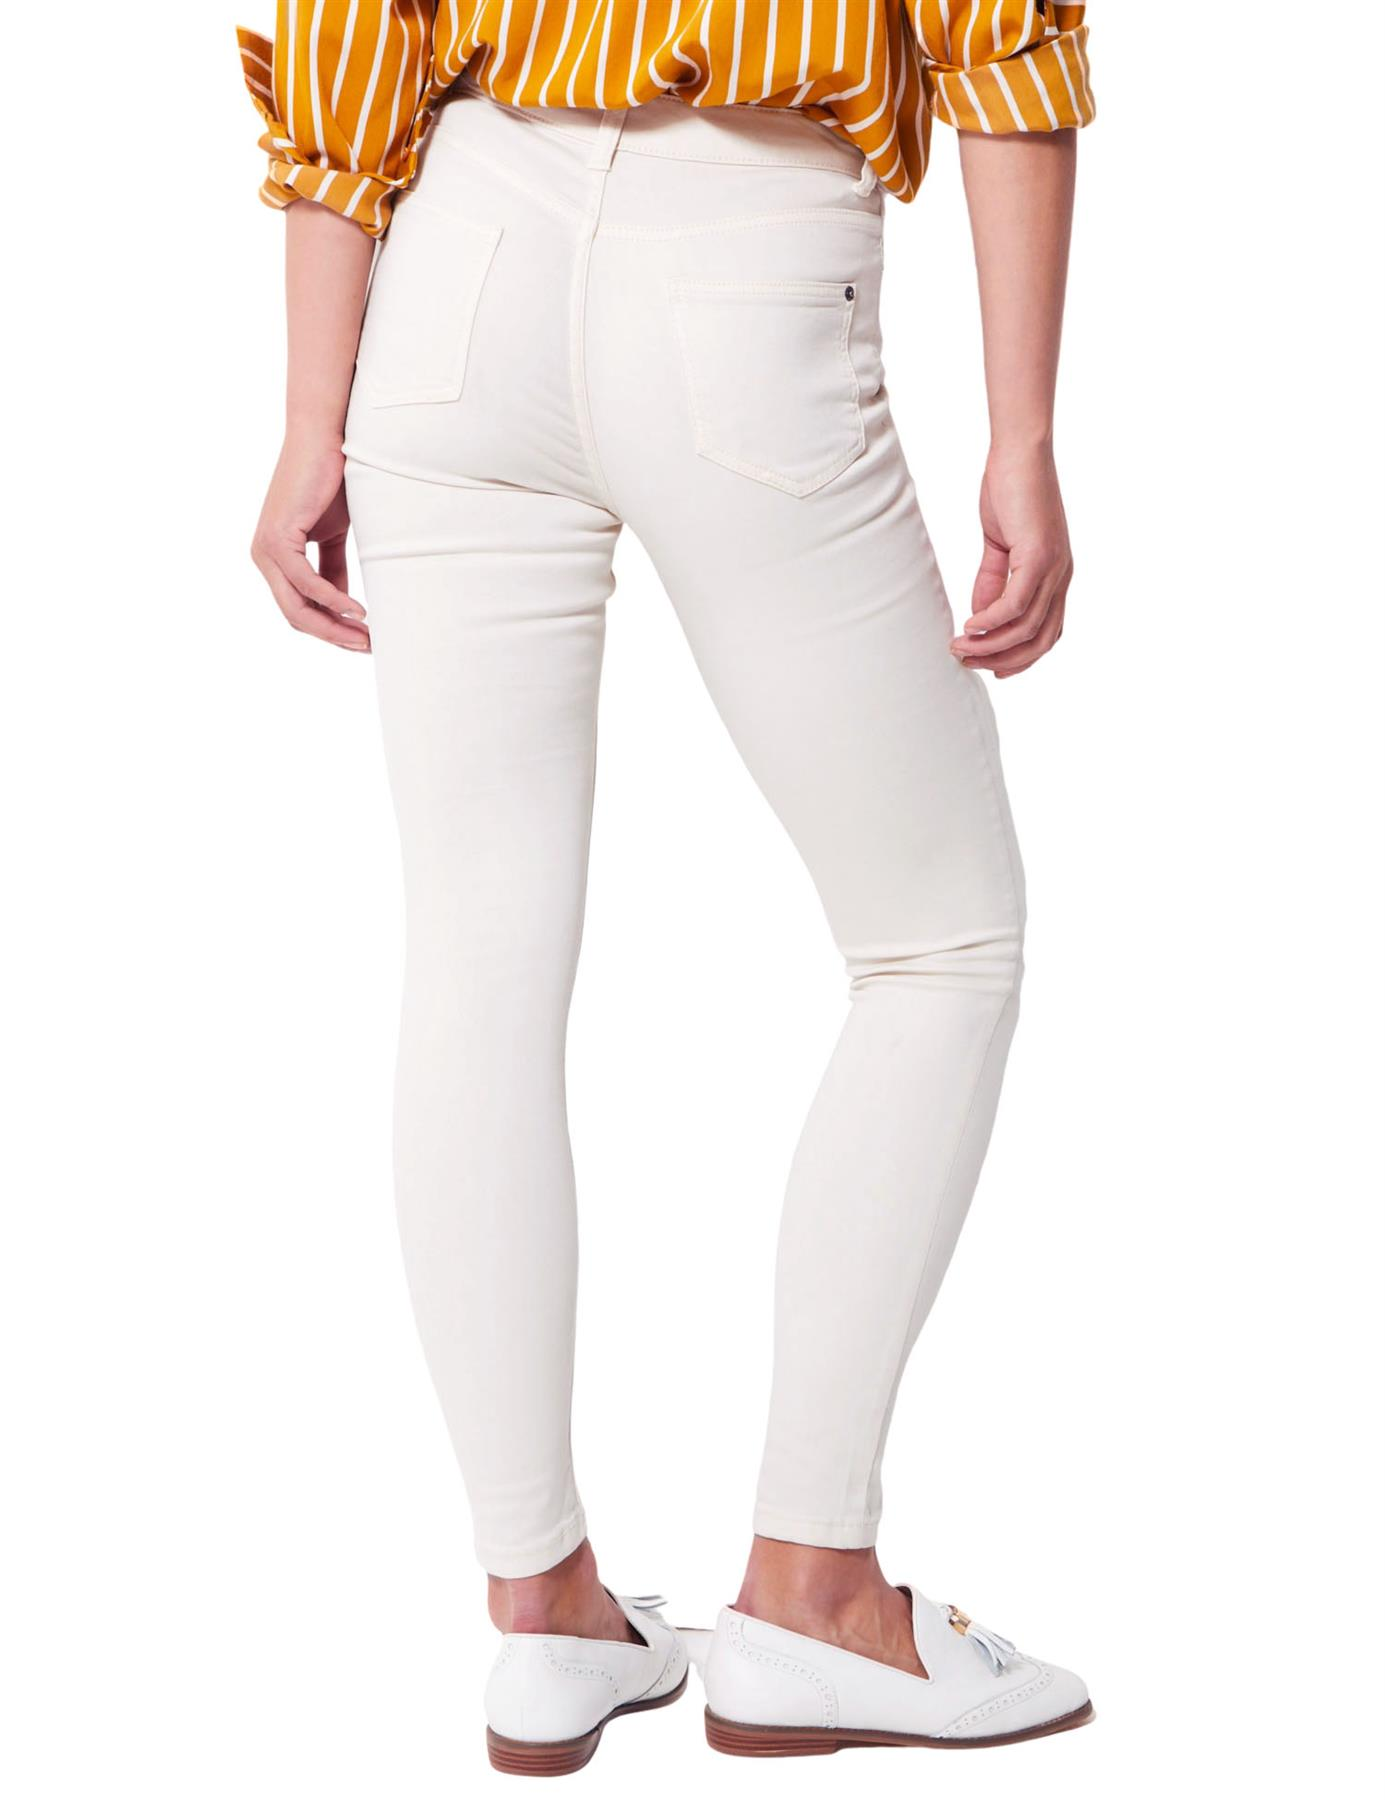 Ex M/&S Womens Ivory Cream Skinny Slim Leg Jeans Plait Trim Short Reg Long